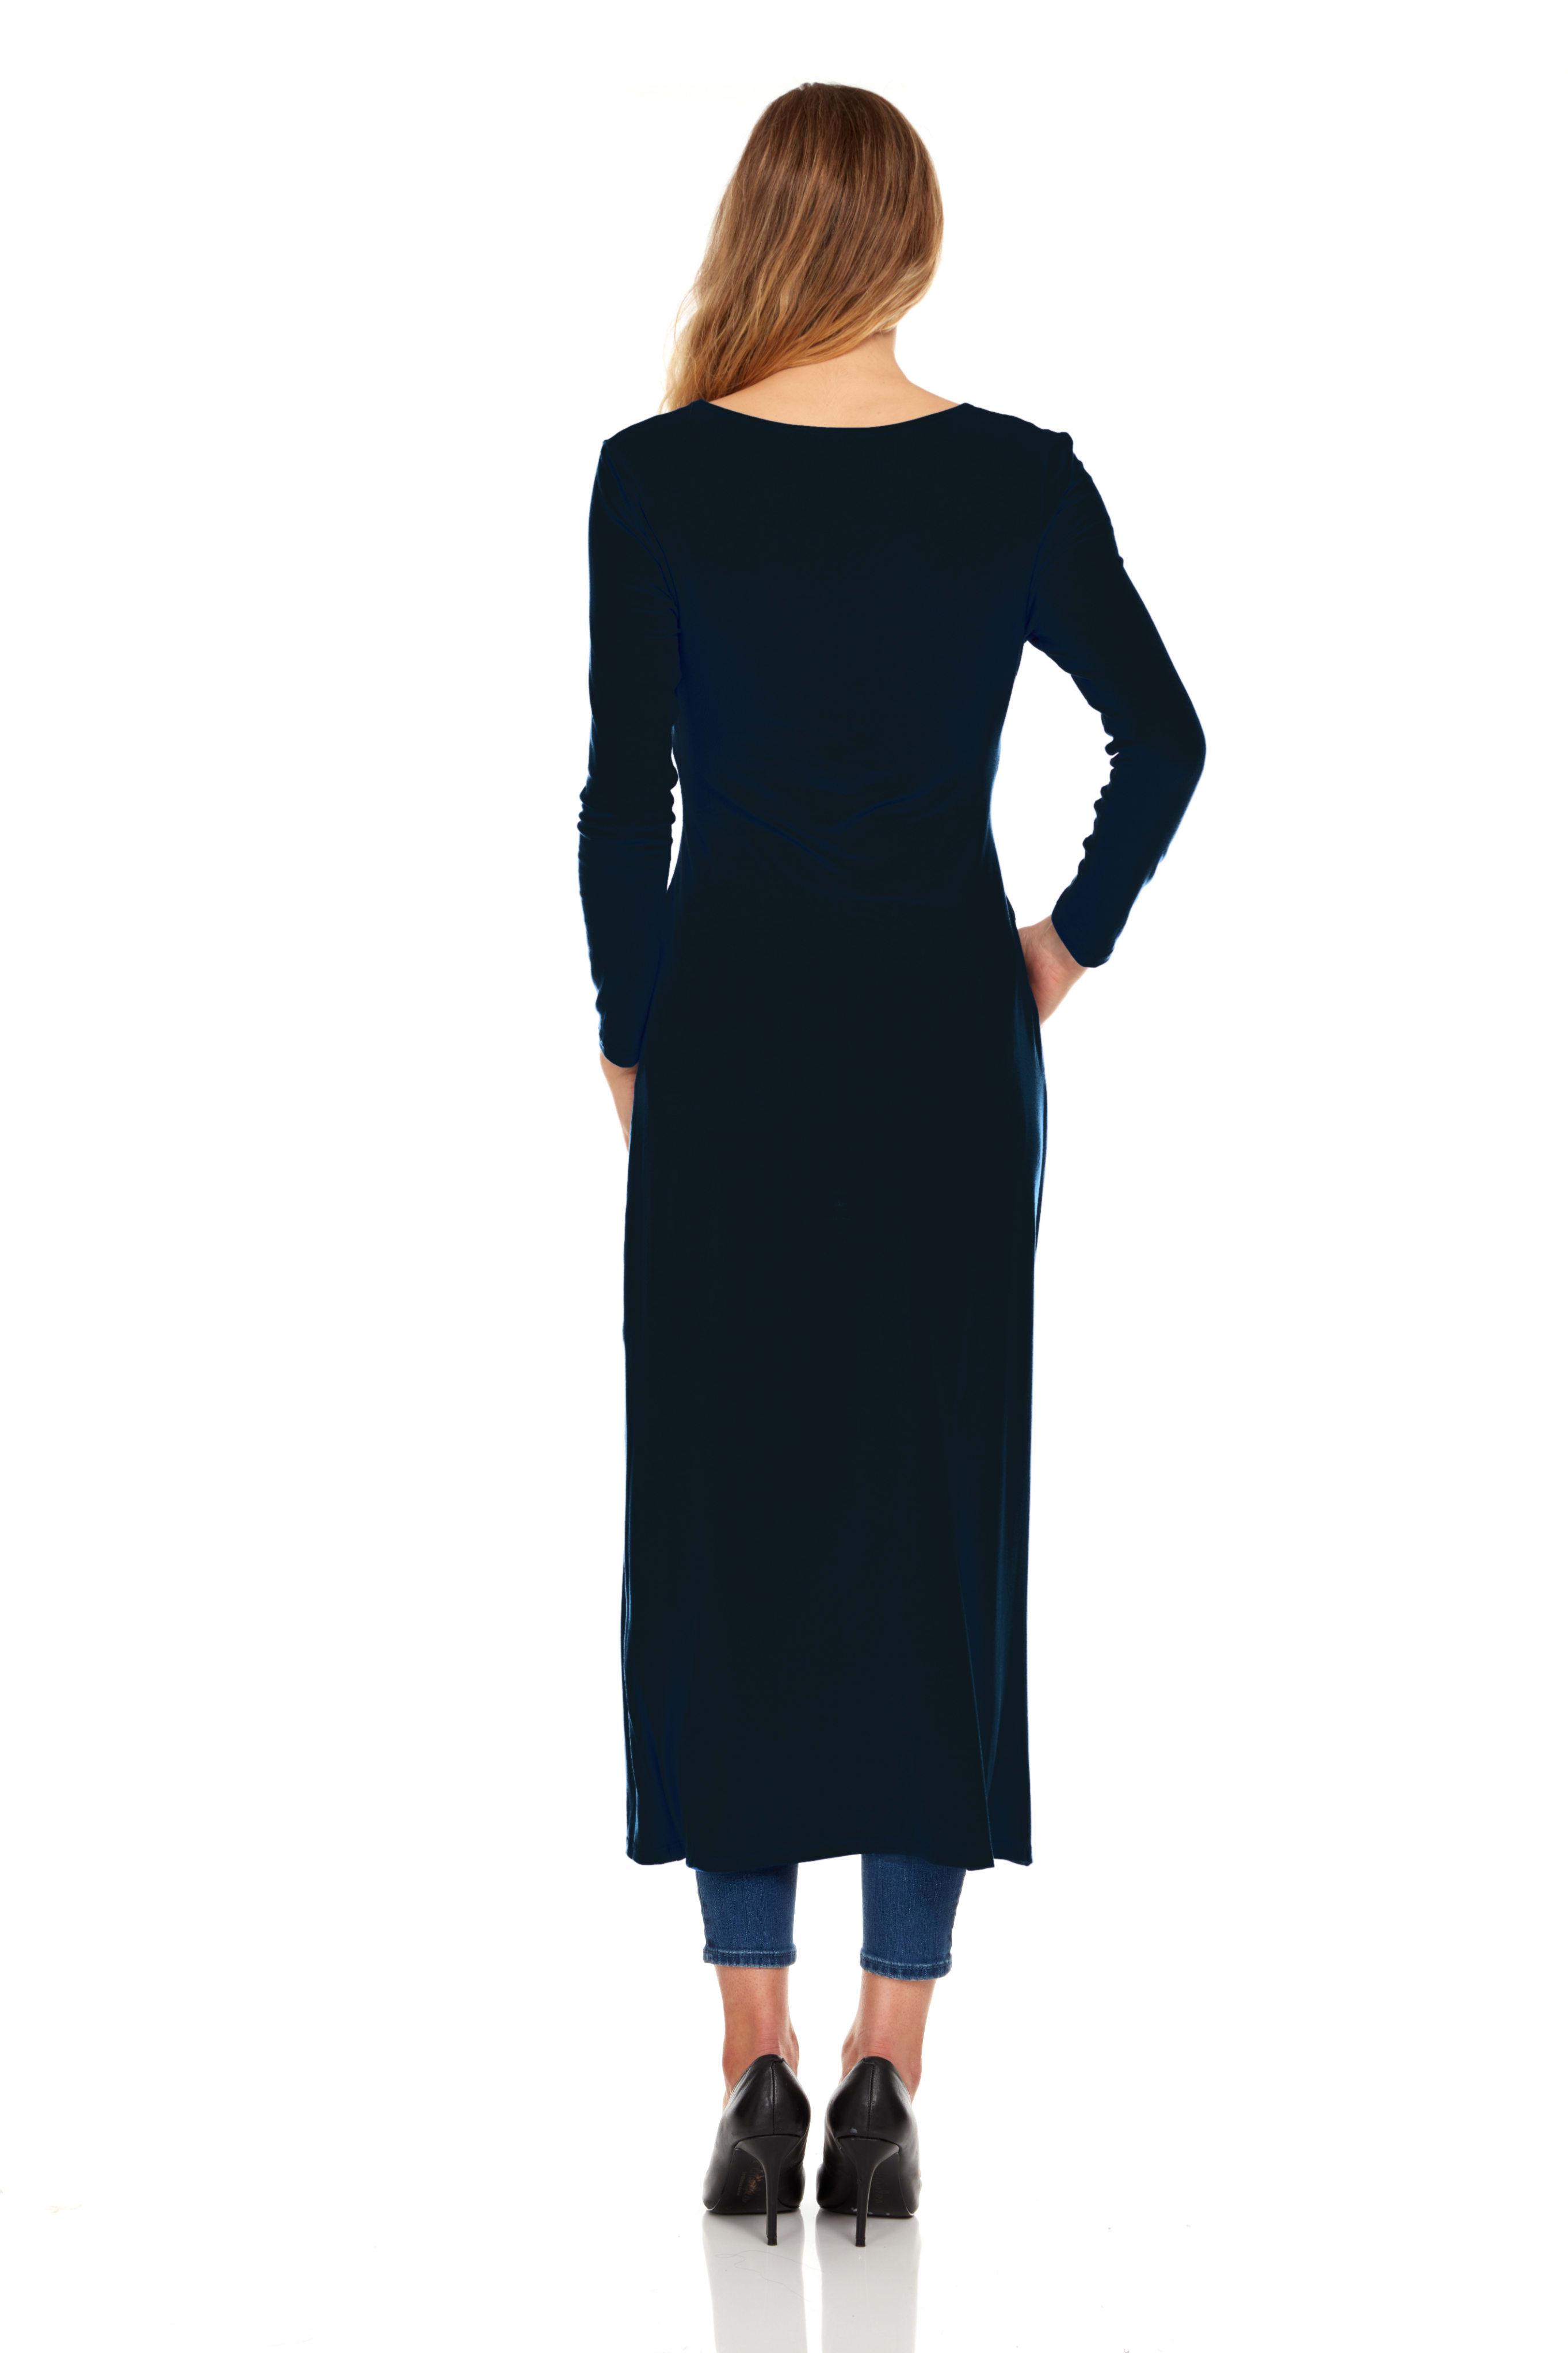 Front Slit Long Sleeve Shirt with Pockets - Black - Back